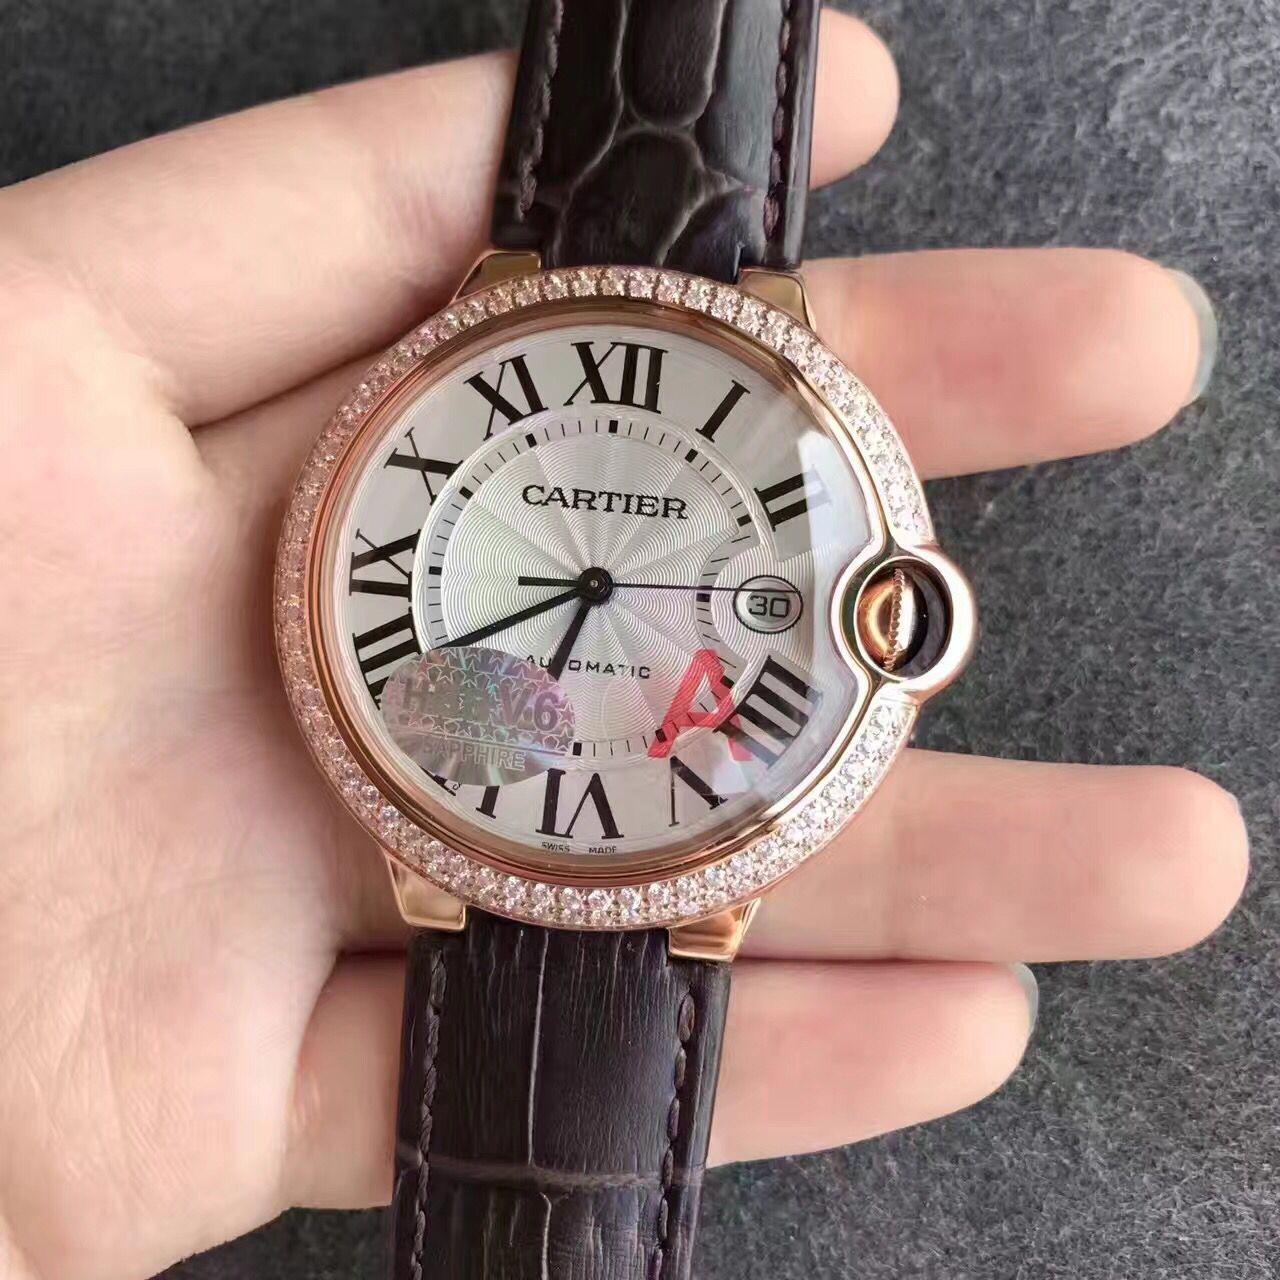 v6厂v7版卡地亚蓝气球系列玫瑰金镶钻42mm男士机械手表